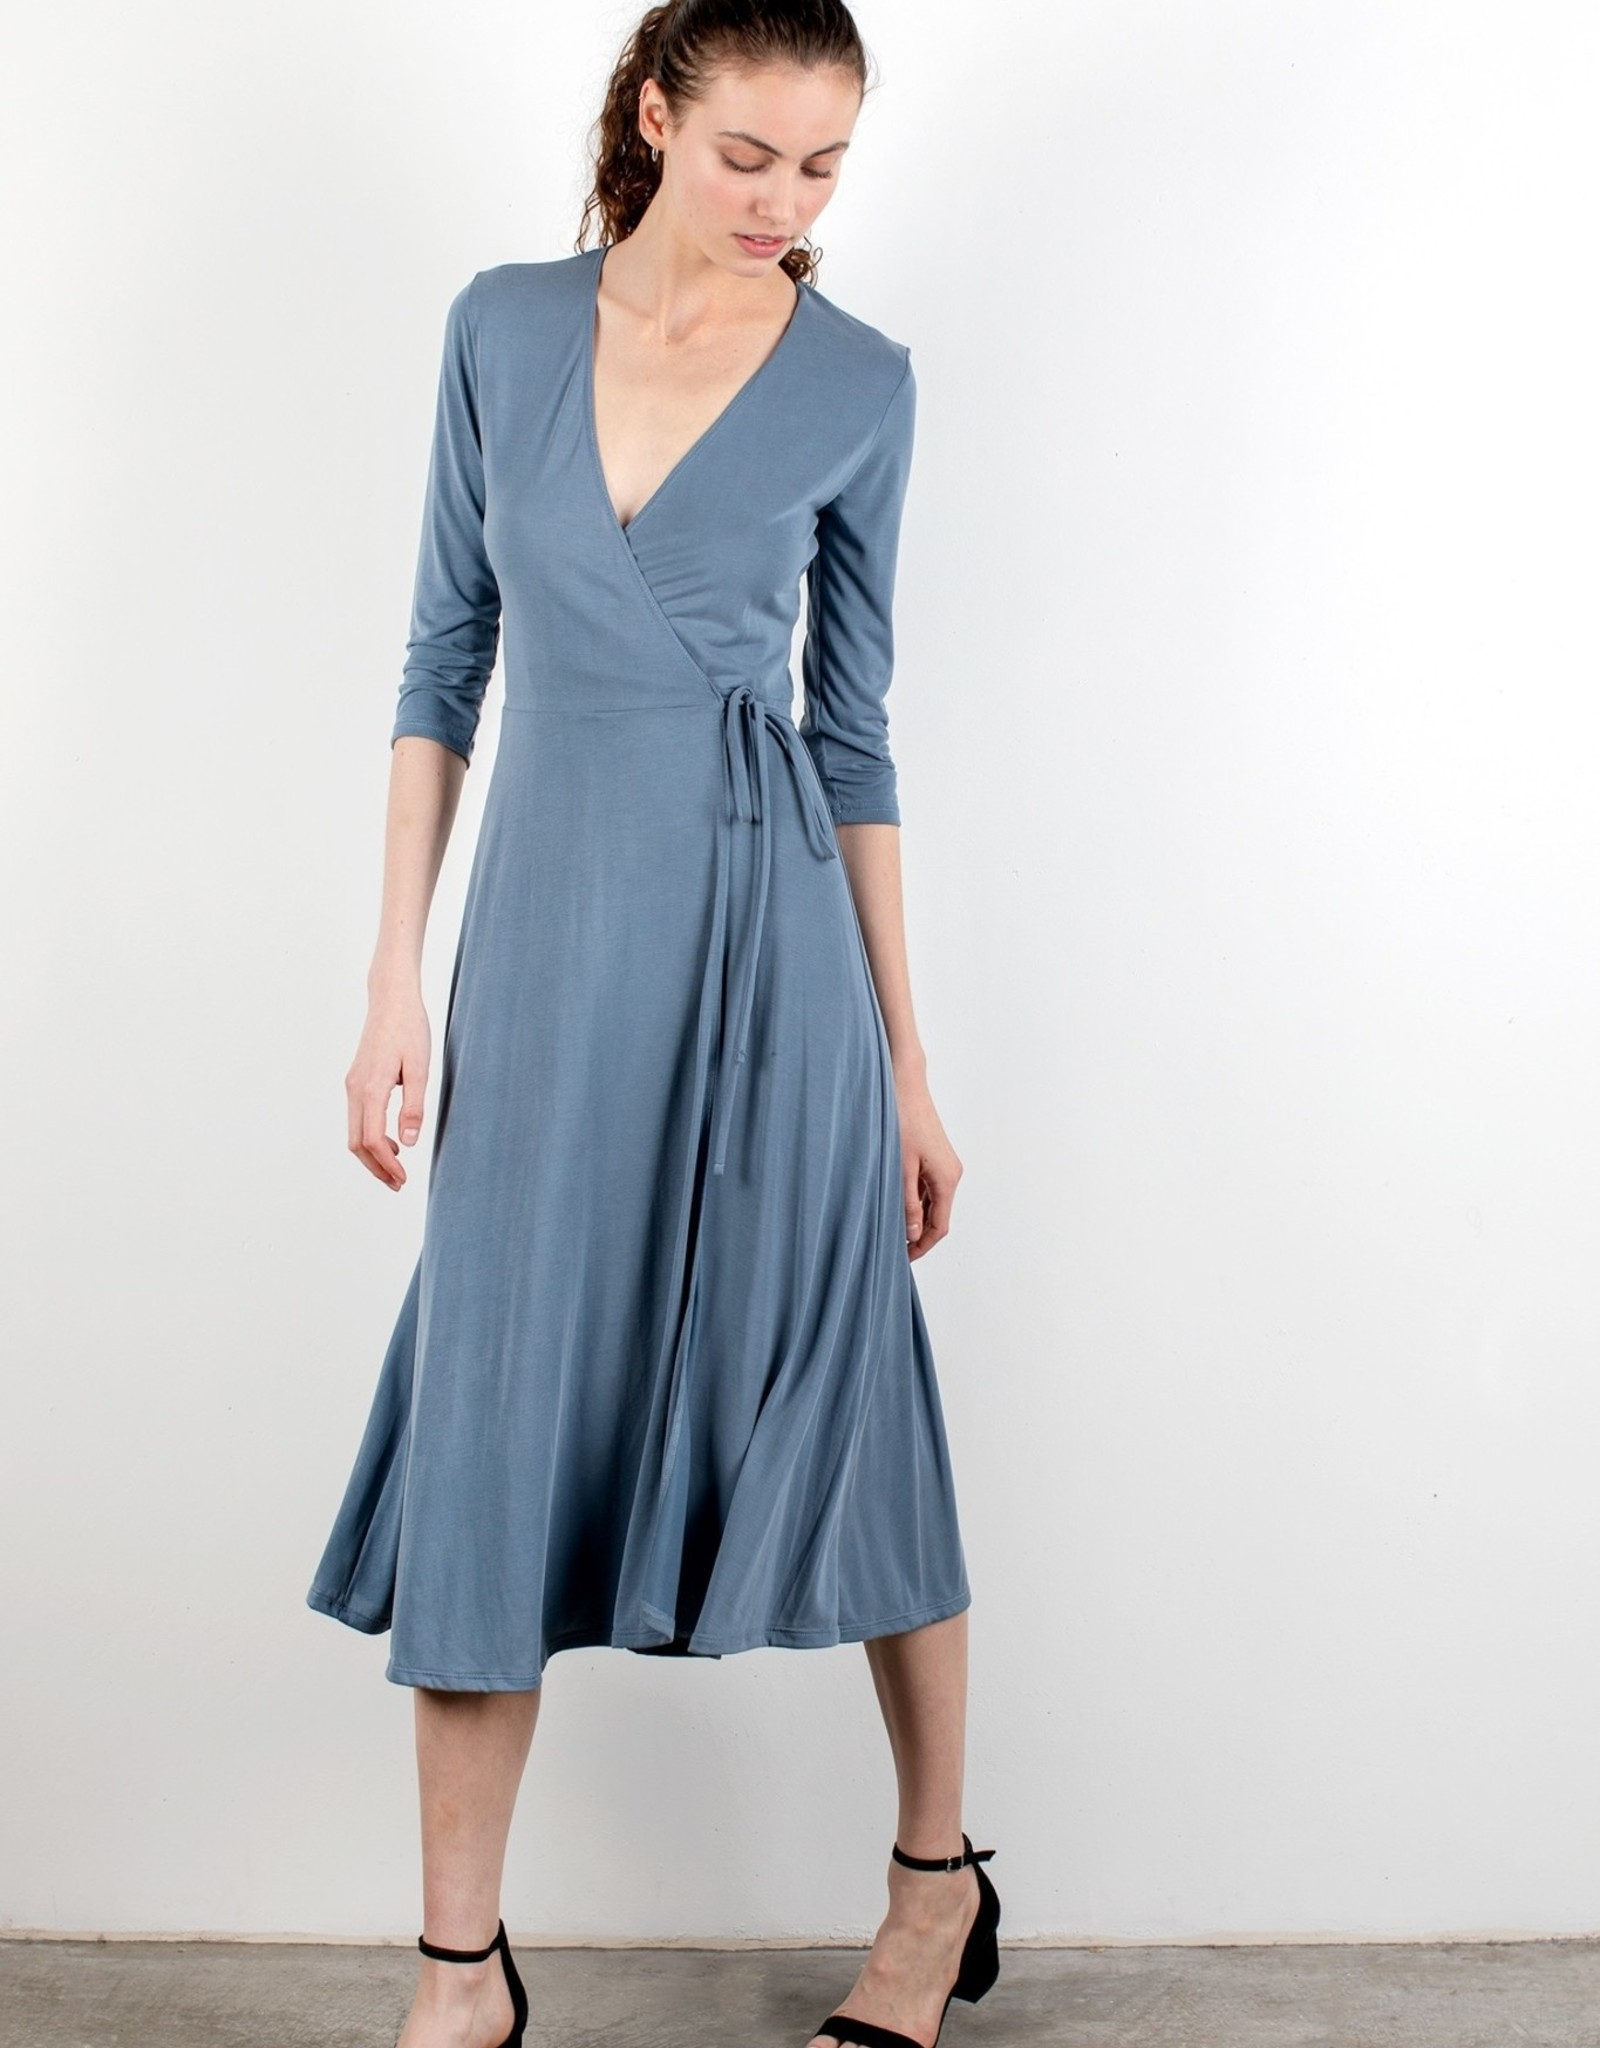 The Yves Dress